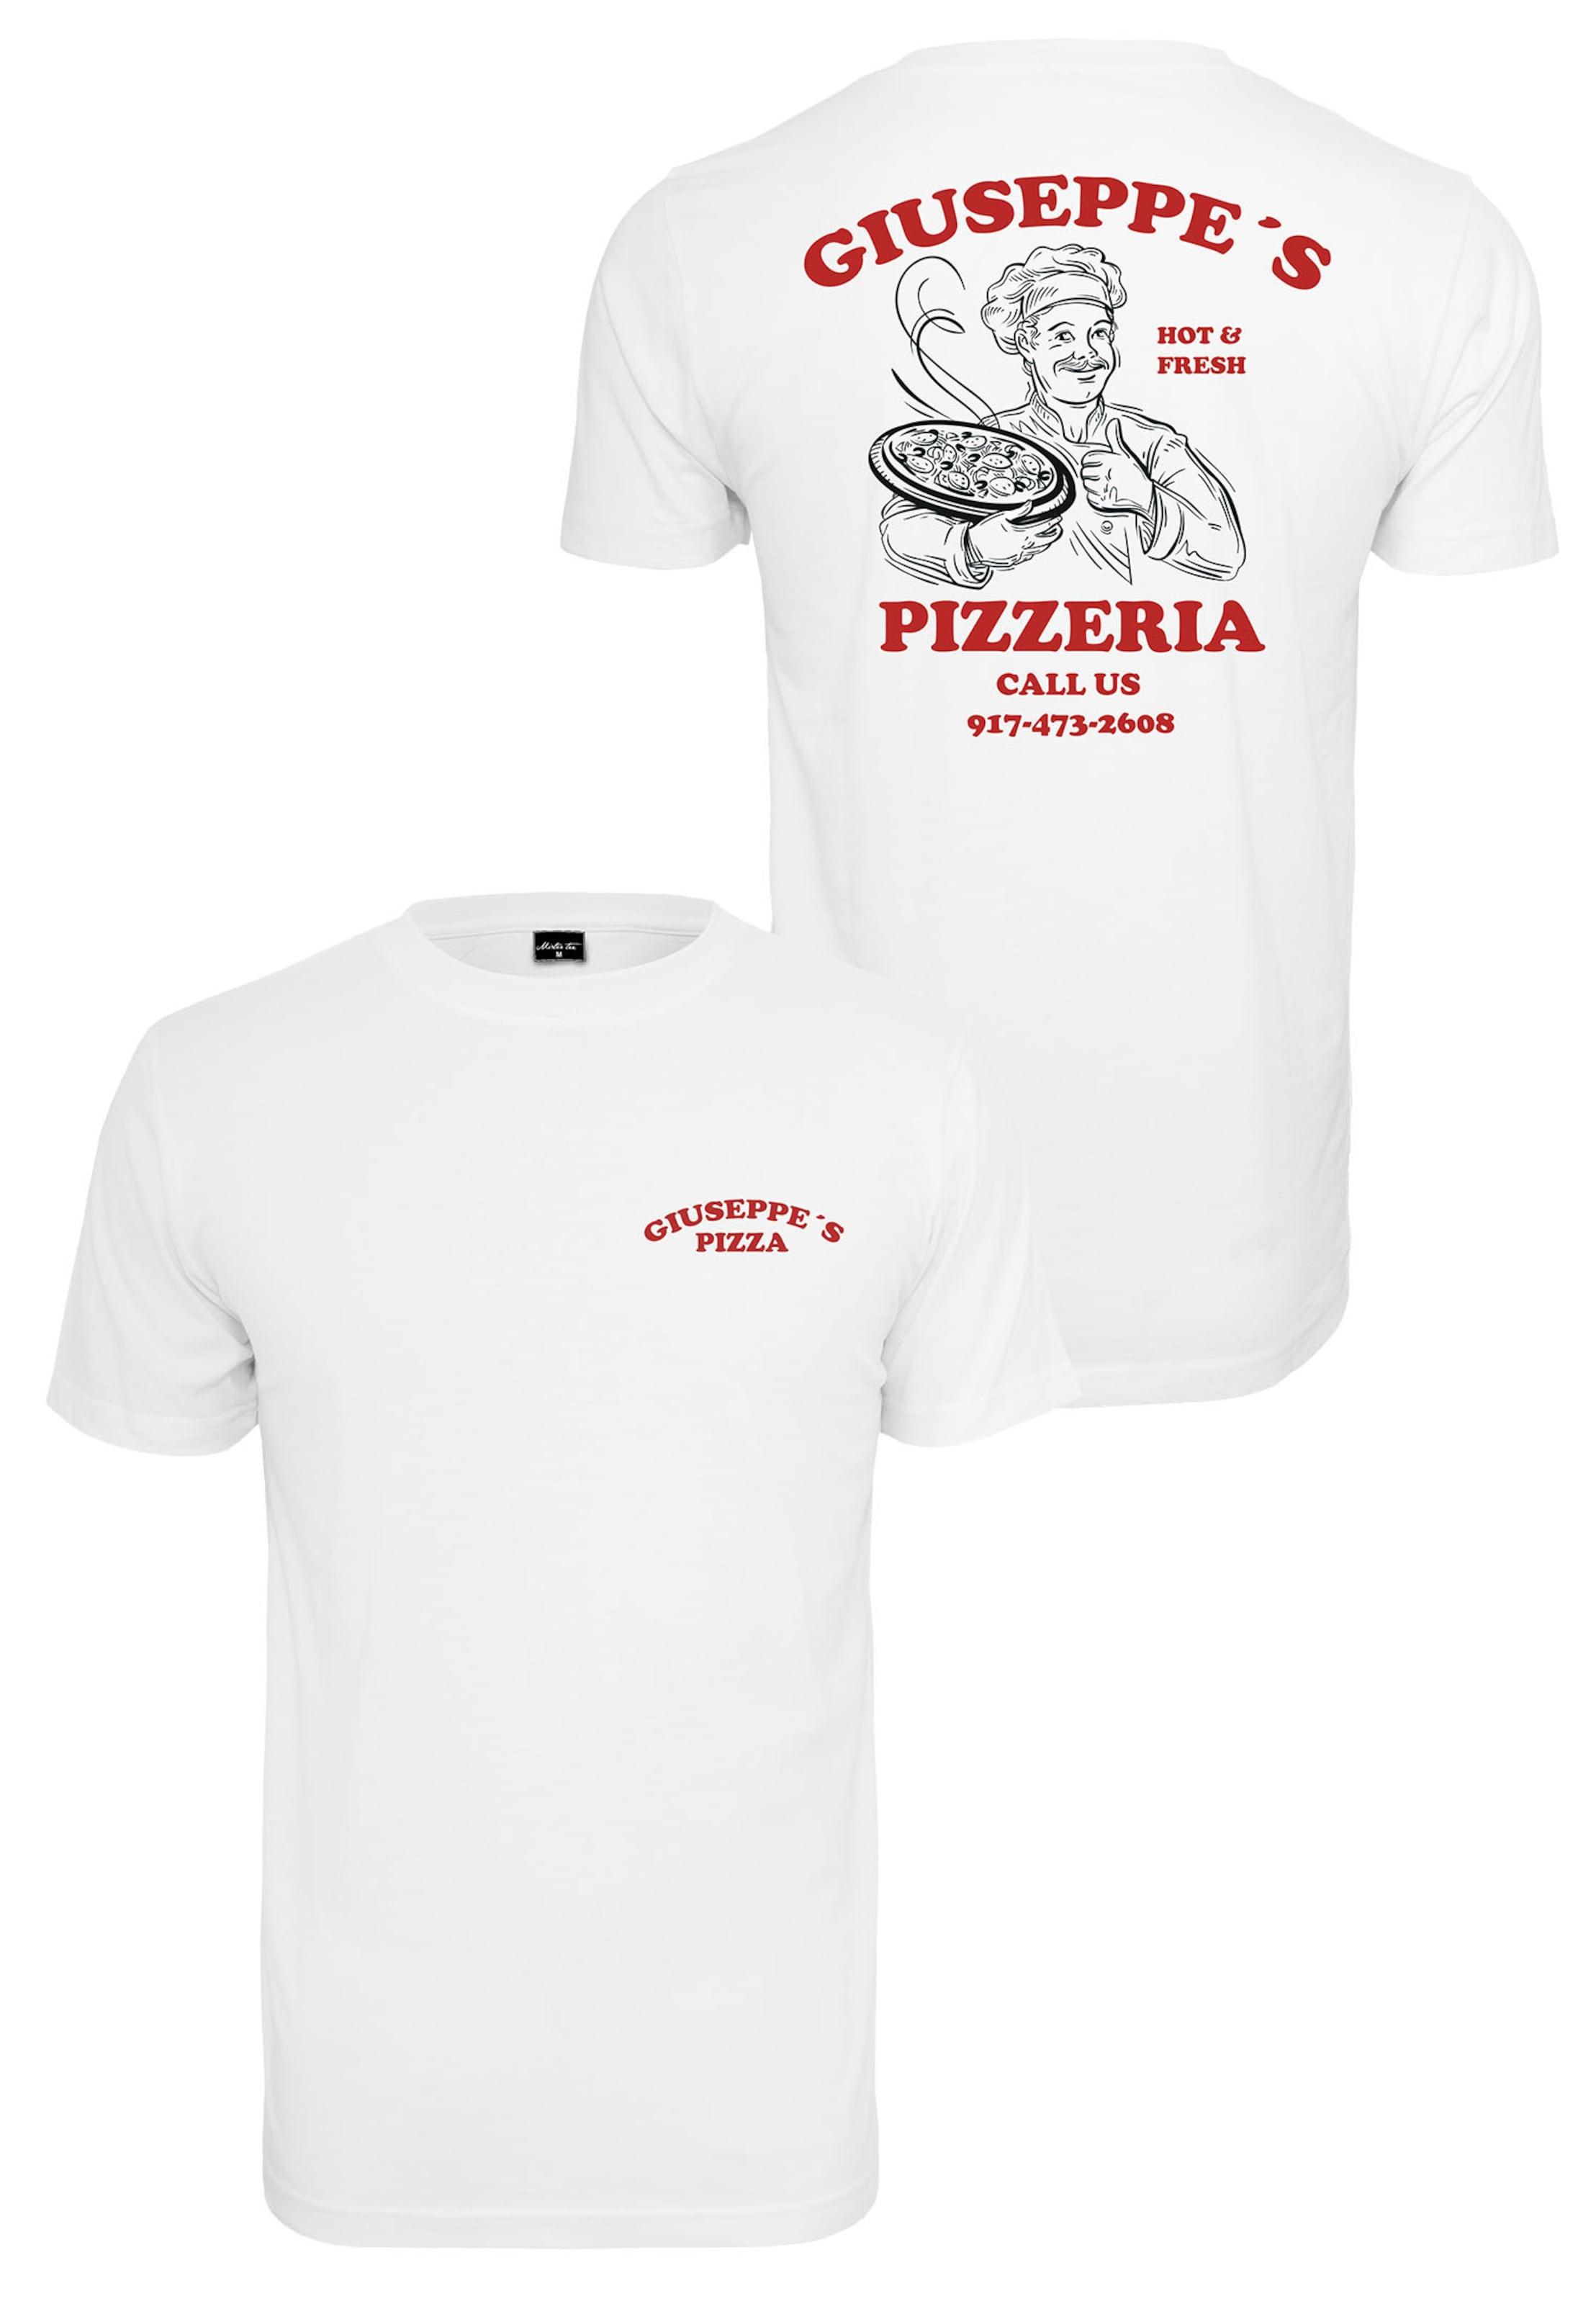 Pizzeria' In Weiß Tee RotSchwarz Mister 'giuseppe's PXwZuTOki